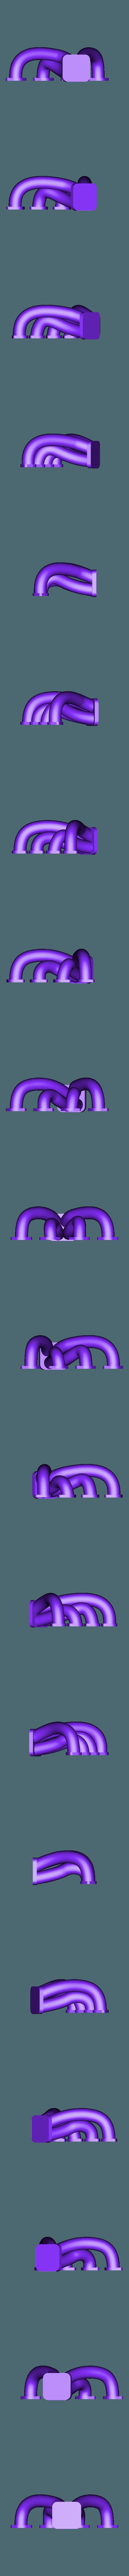 Manifold.STL Download STL file Fury road hotrod bodyshell 1/10 • 3D printing design, RCGANG93